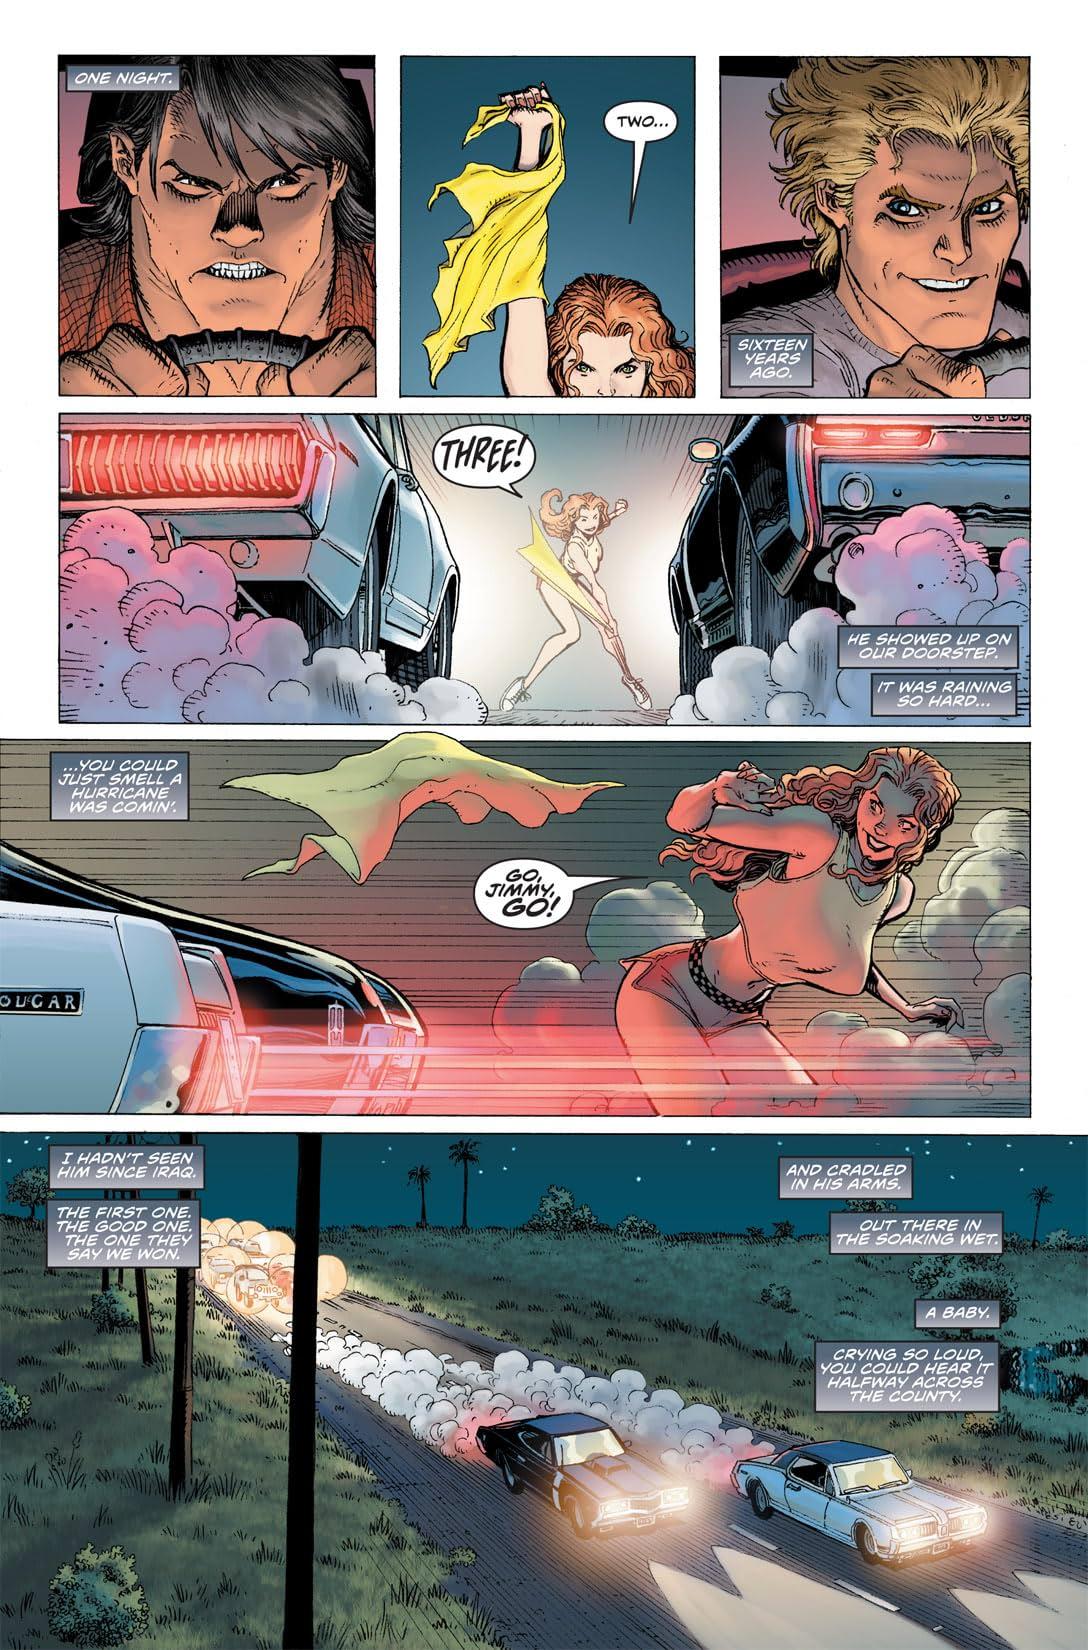 Ultimate Comics X #1